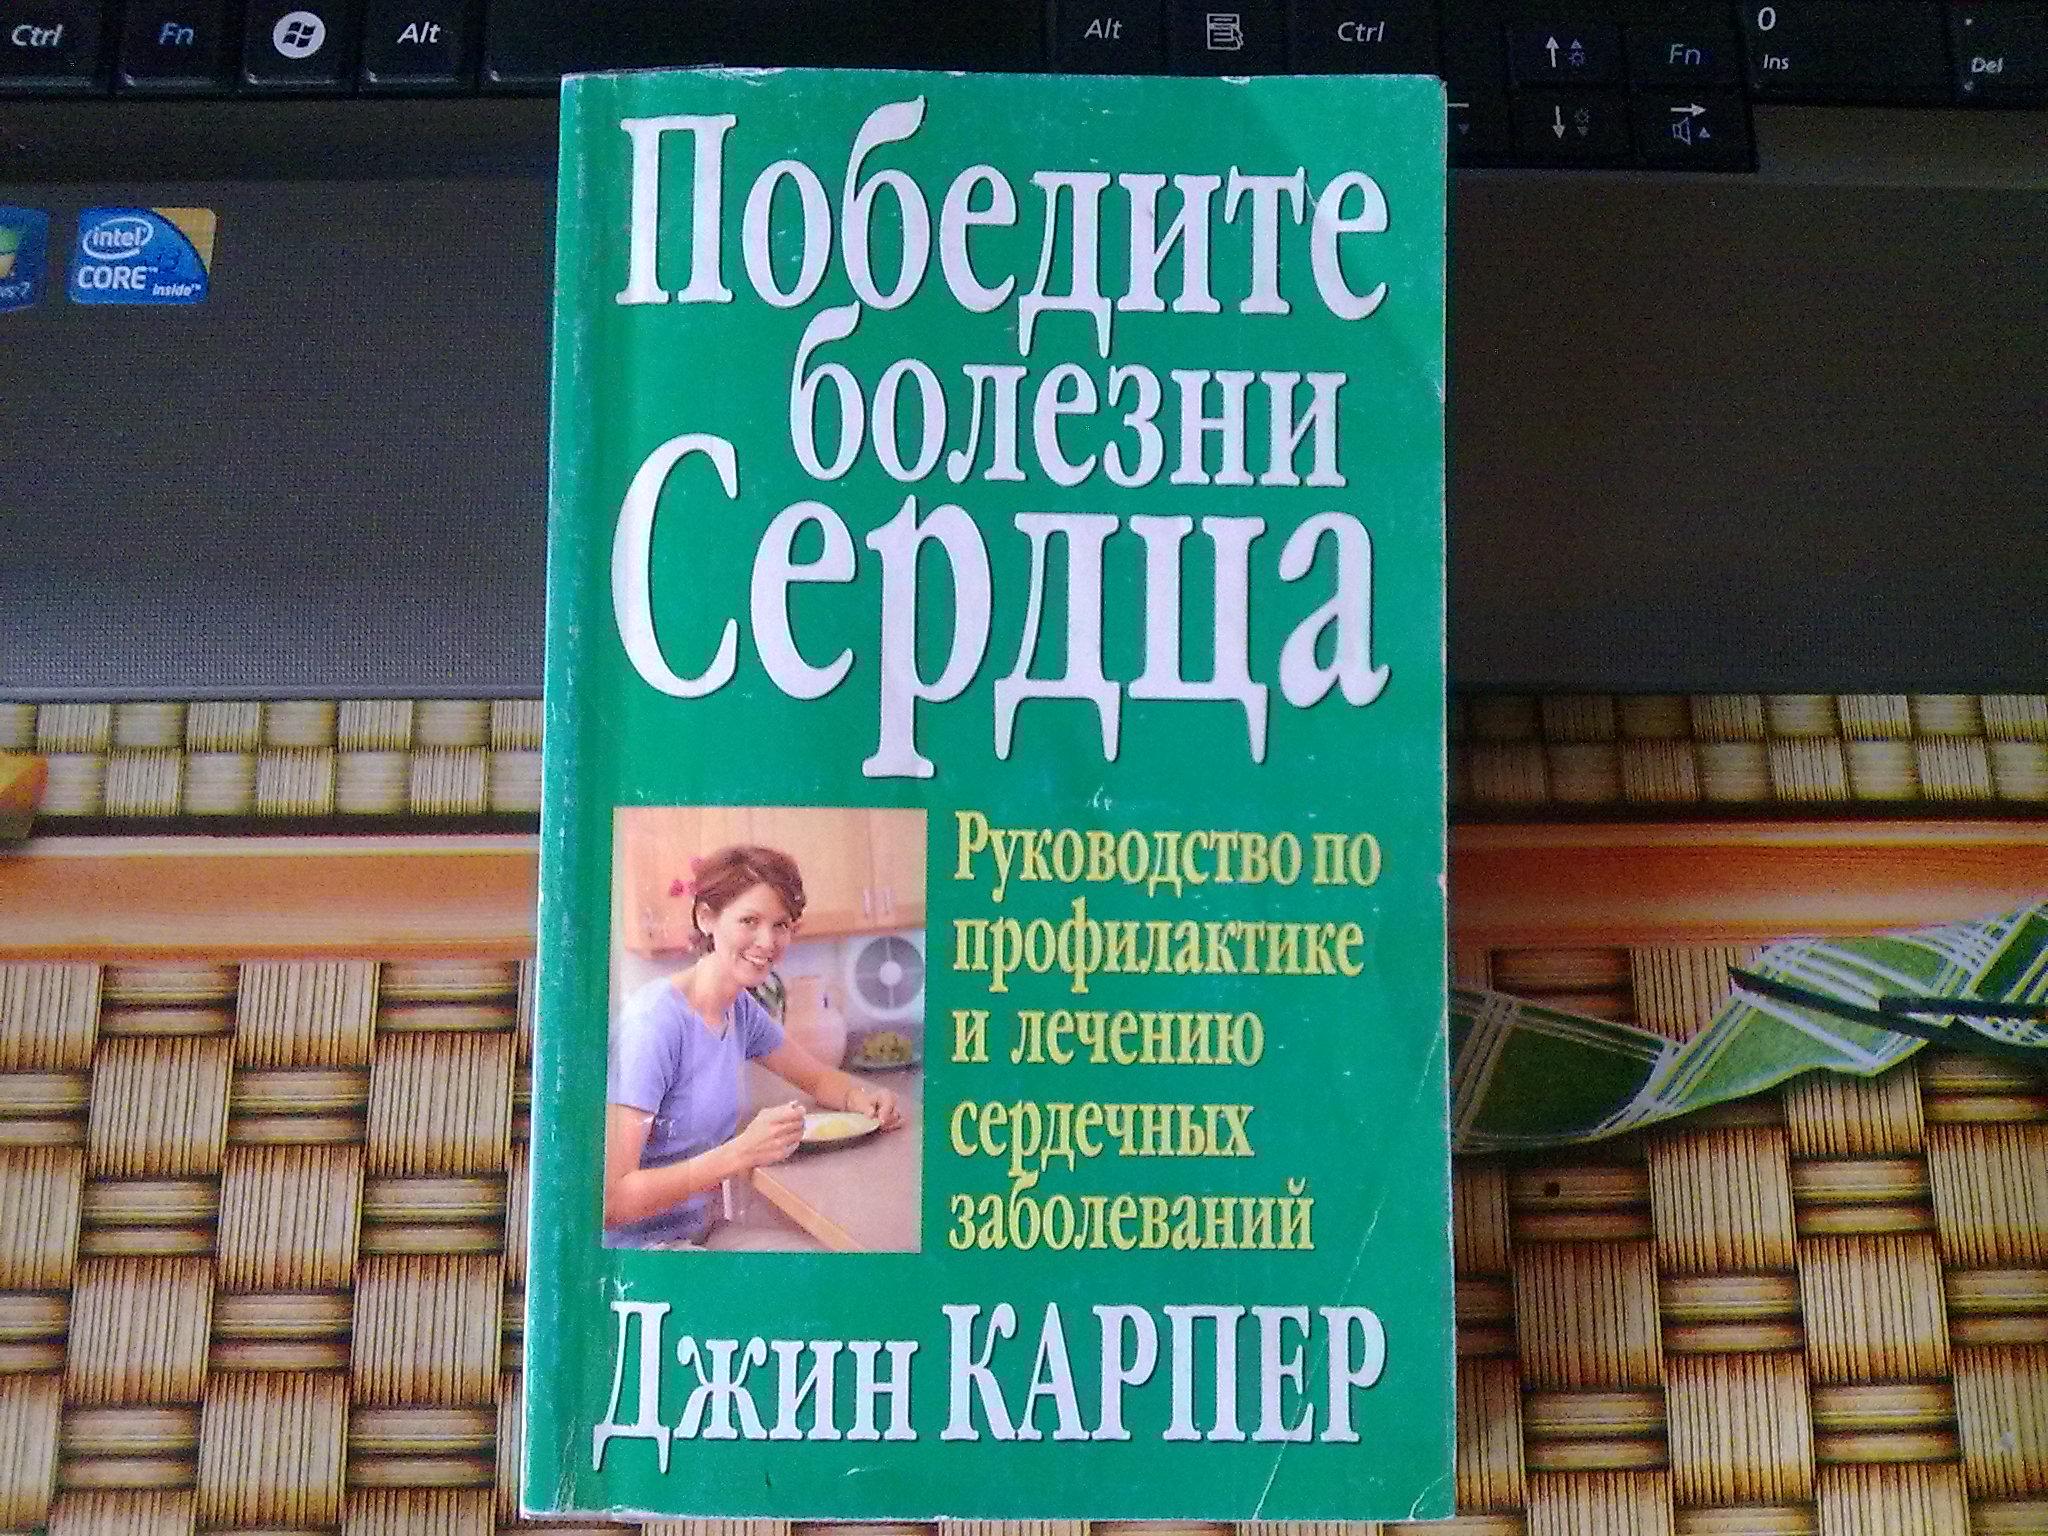 http://s5.uploads.ru/oQKWp.jpg